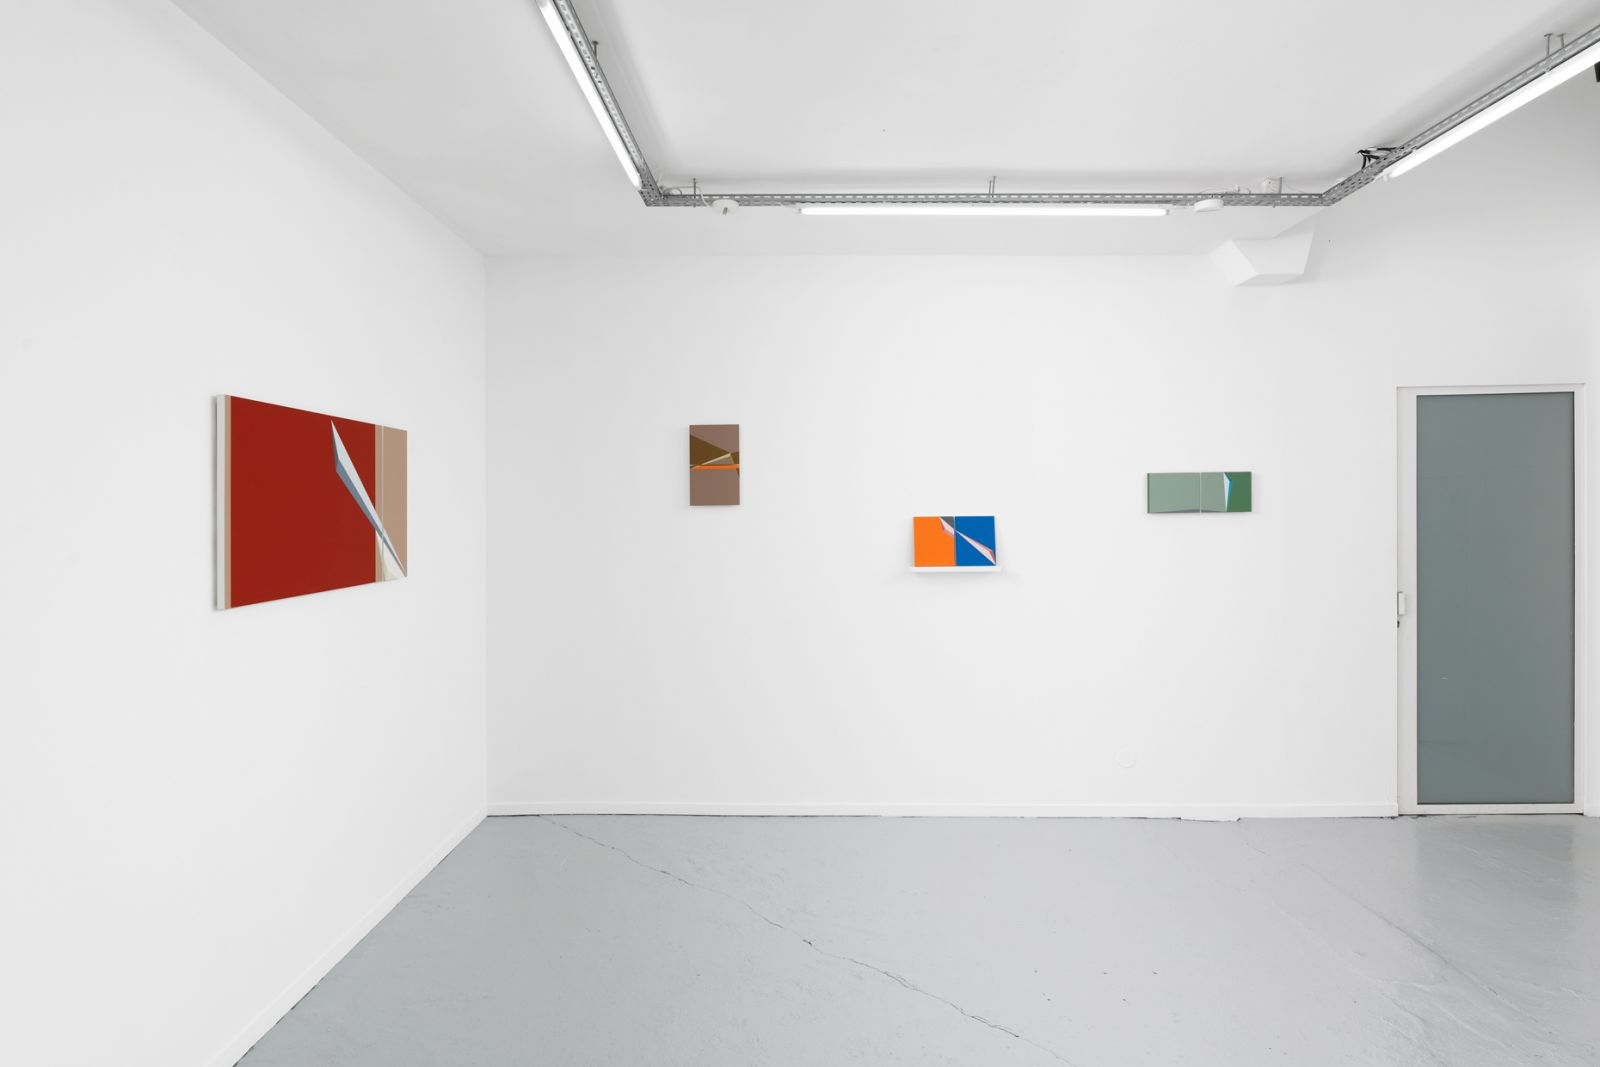 01-parties-fines-progress-gallery-vue-expo-5-aurelien-mole-web-f2ba08a3c8adc329e28727950299984c